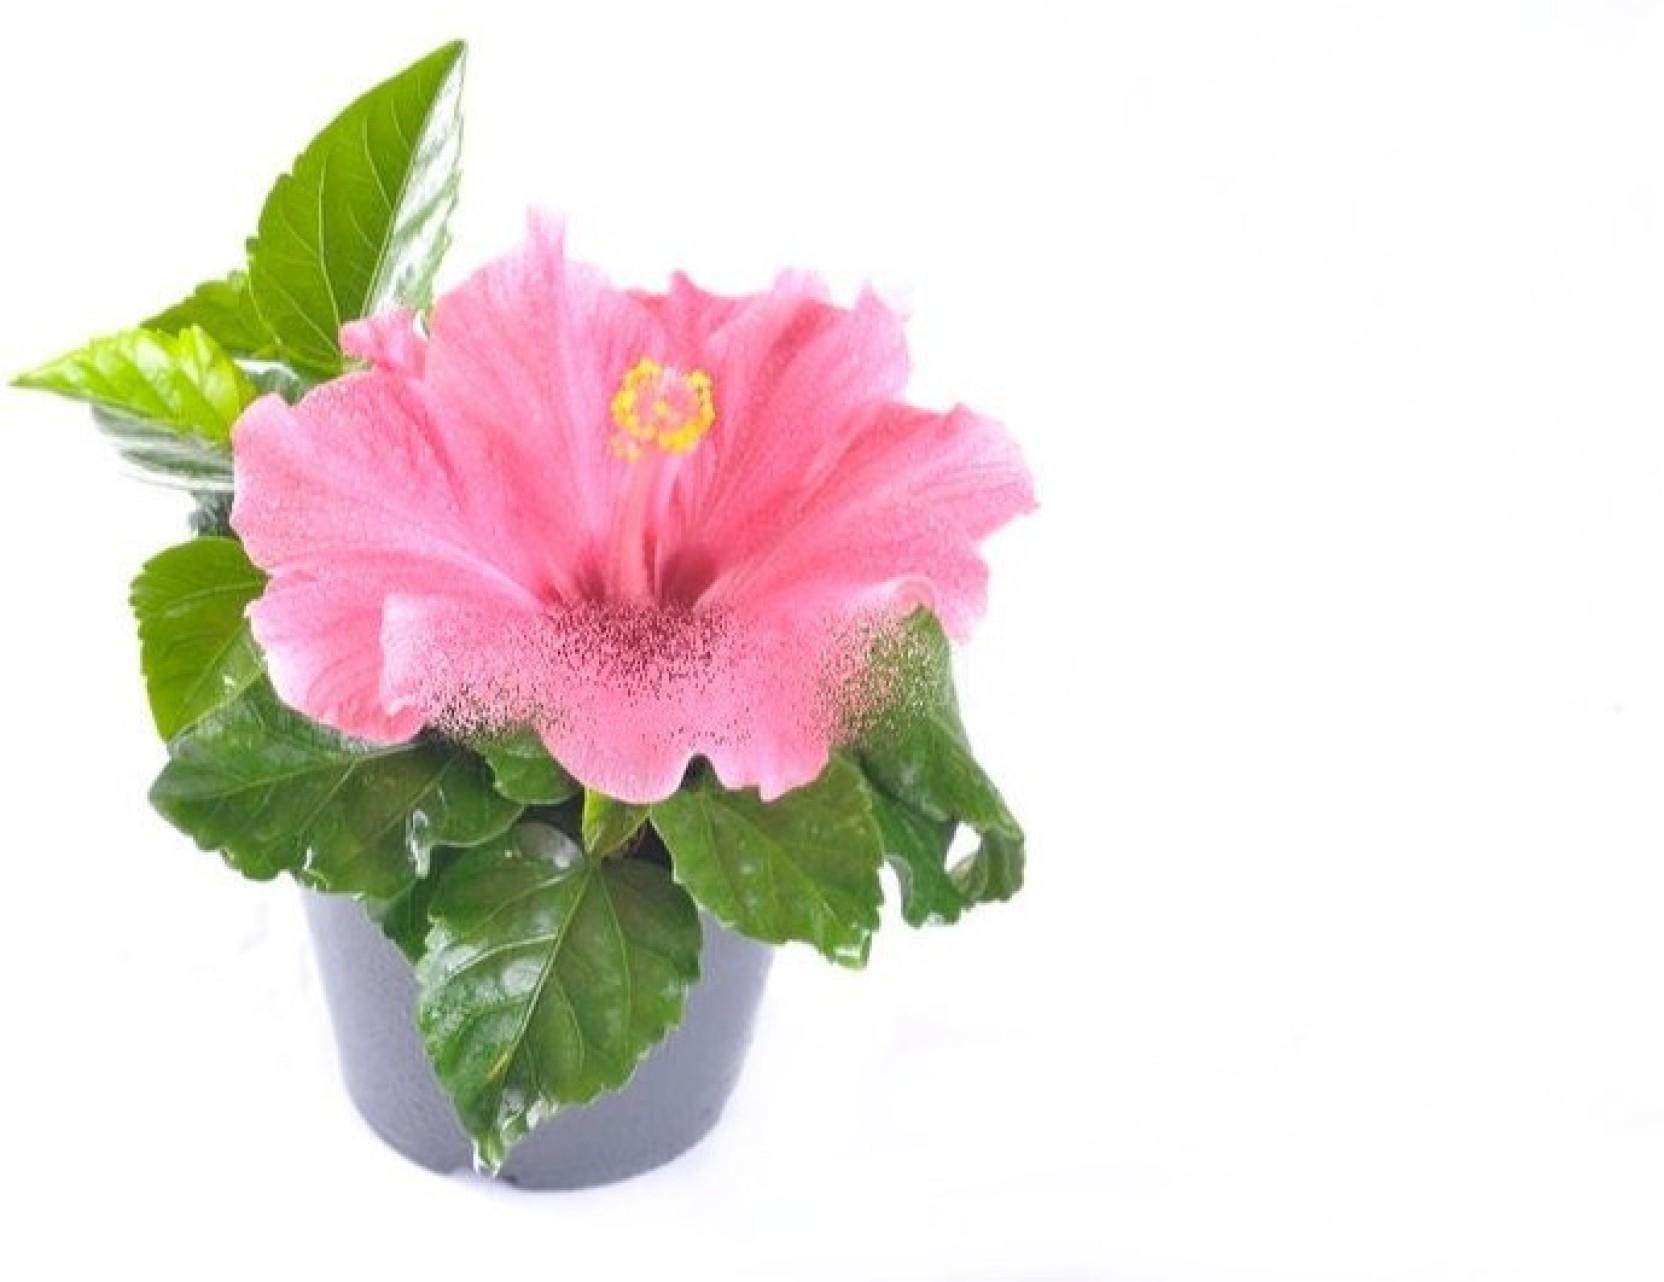 Ojorey Hibiscus Rosa Dwarf Live Plant English Variety Flower Plant